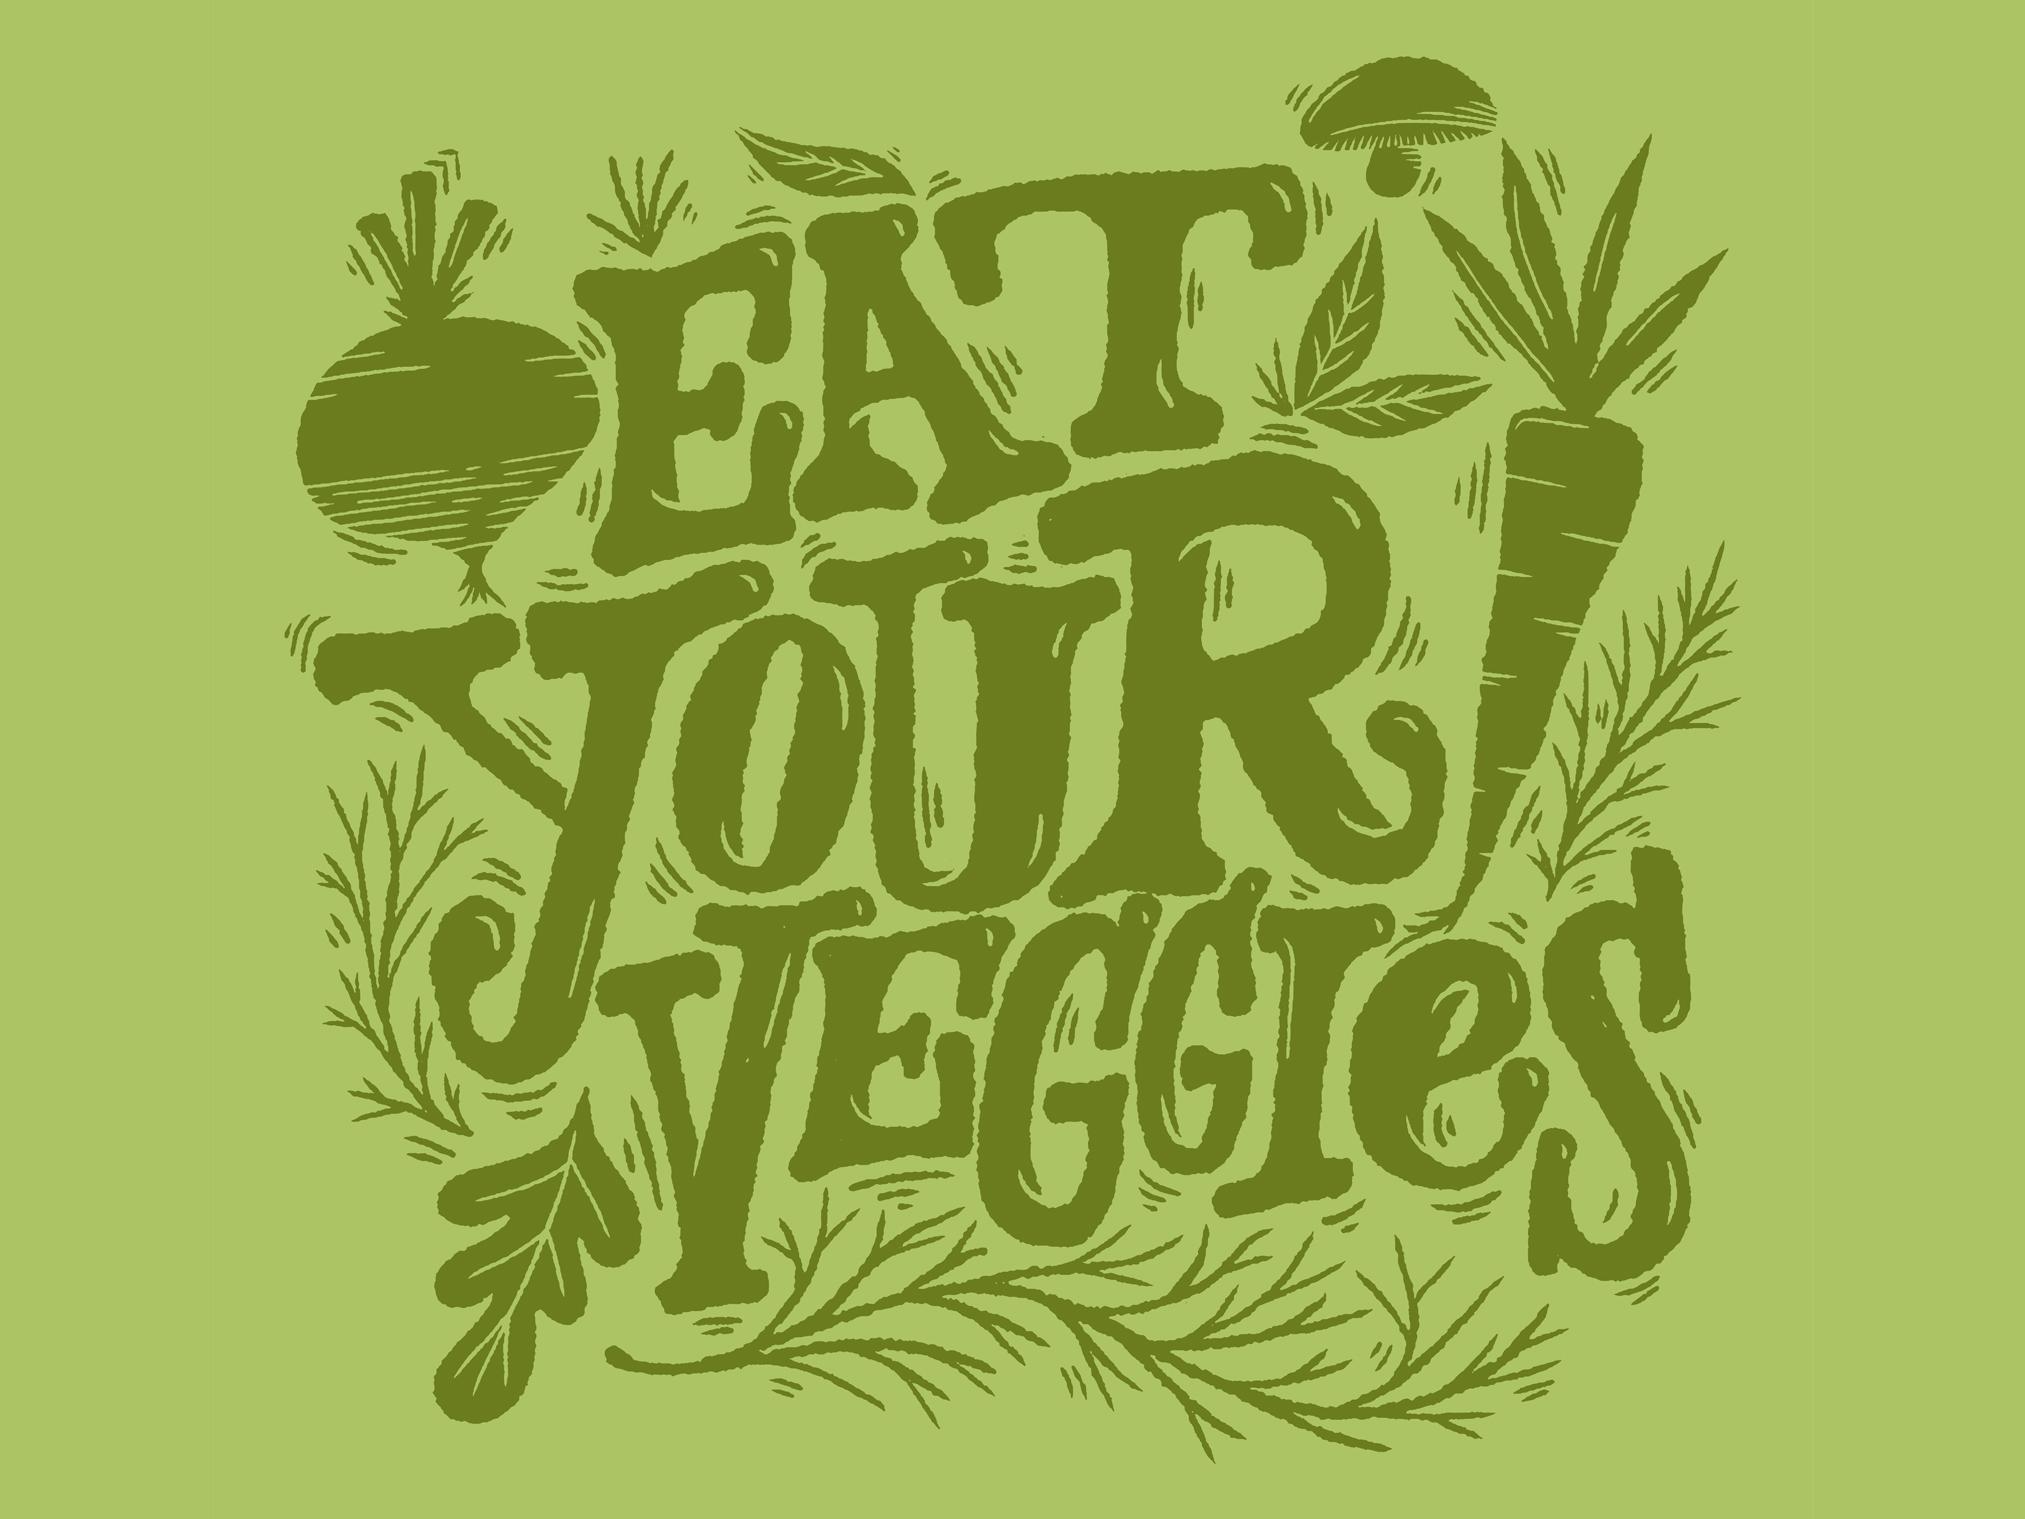 EAT-VEGGIES.jpg